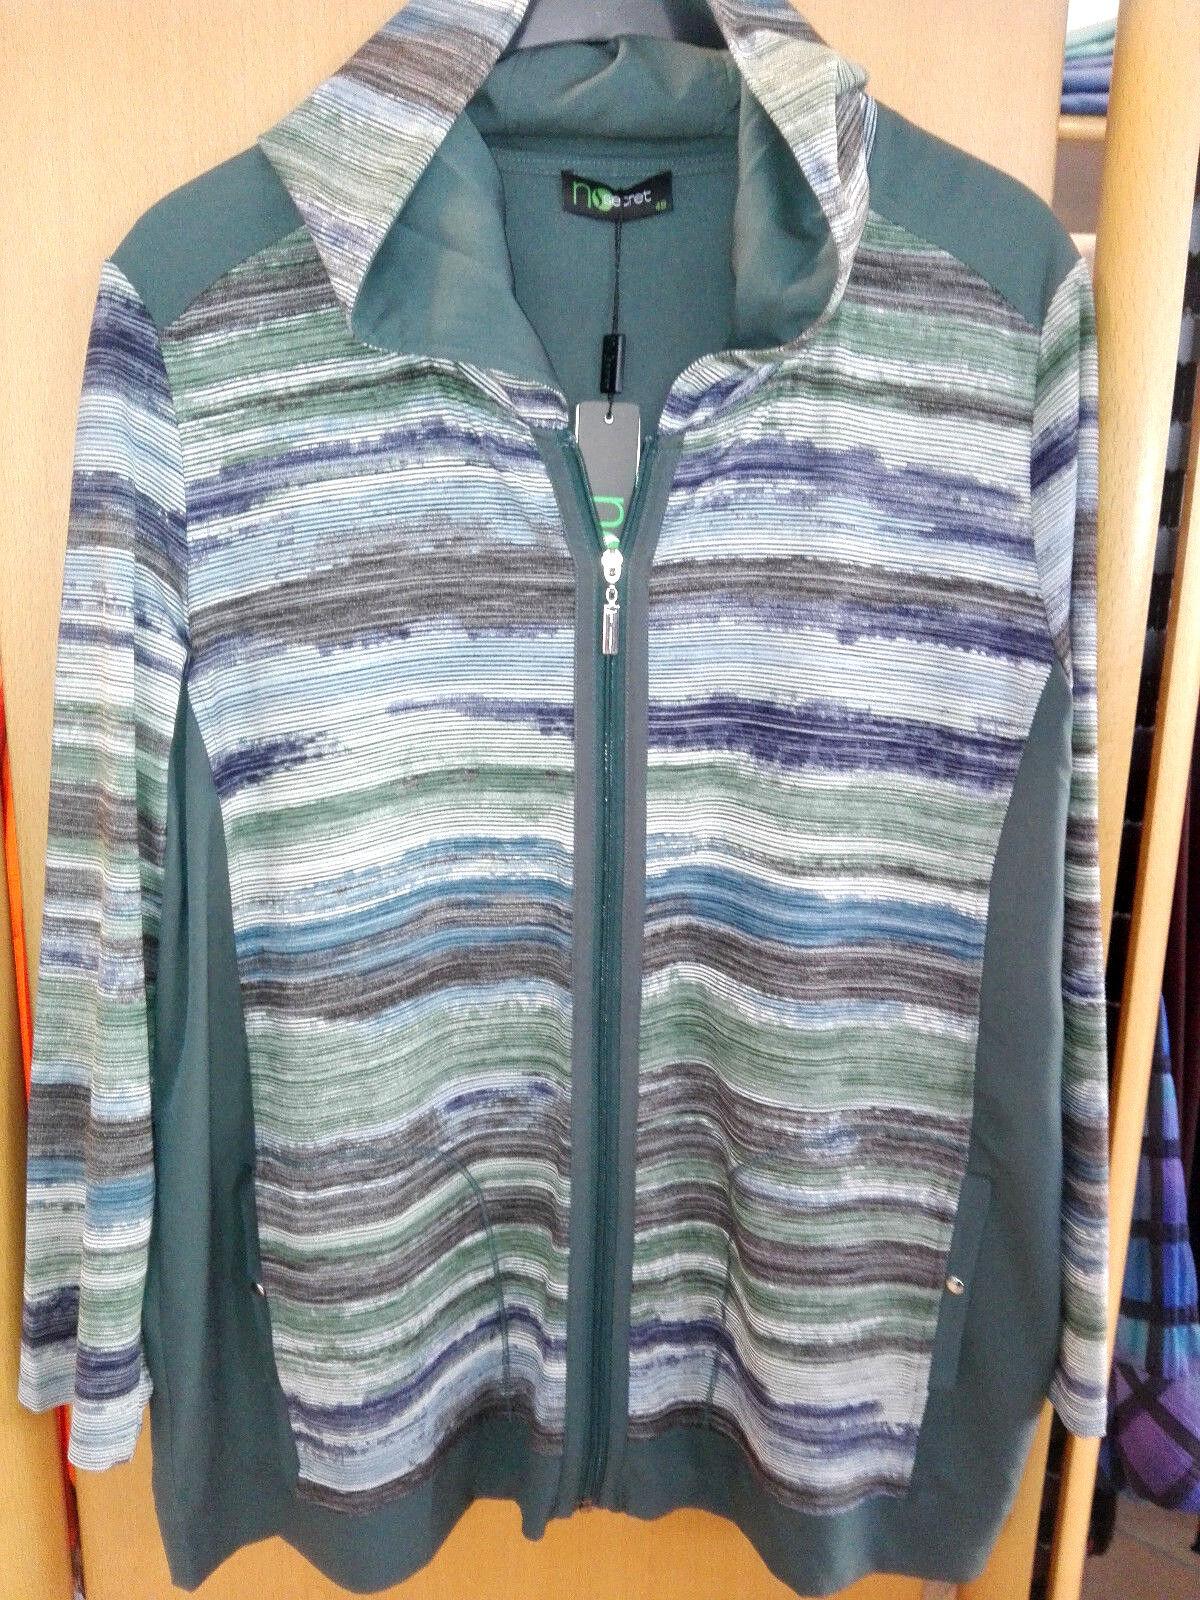 No Secret modisches Damen Shirt Jacke grün bunt Gr. 52 junge Mode große Größen